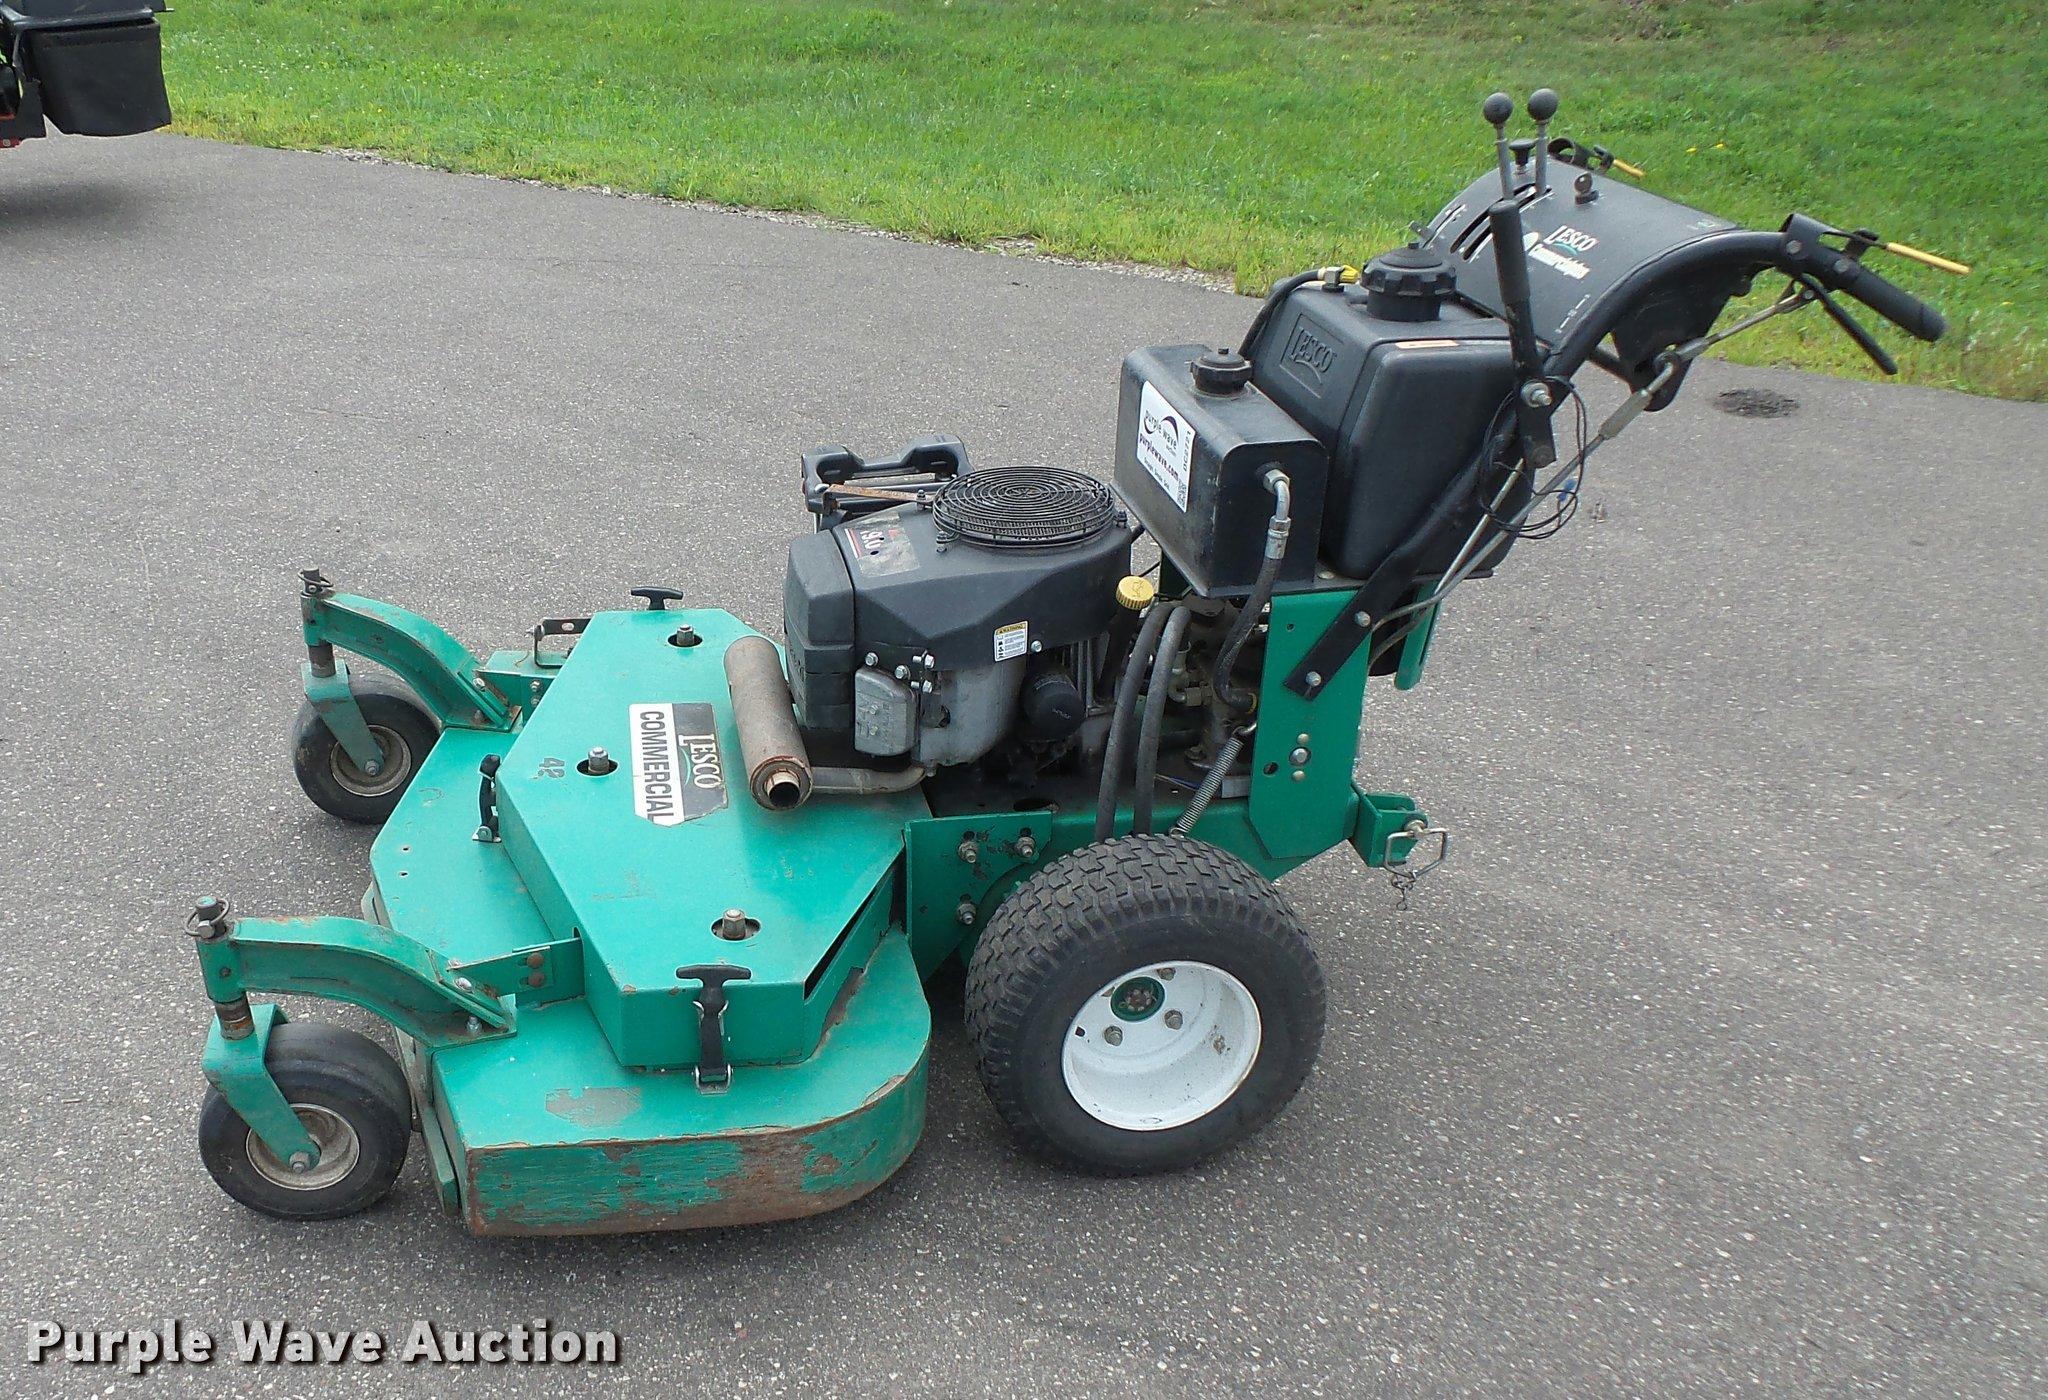 ... Lesco Commercial Plus lawn mower Full size in new window ...